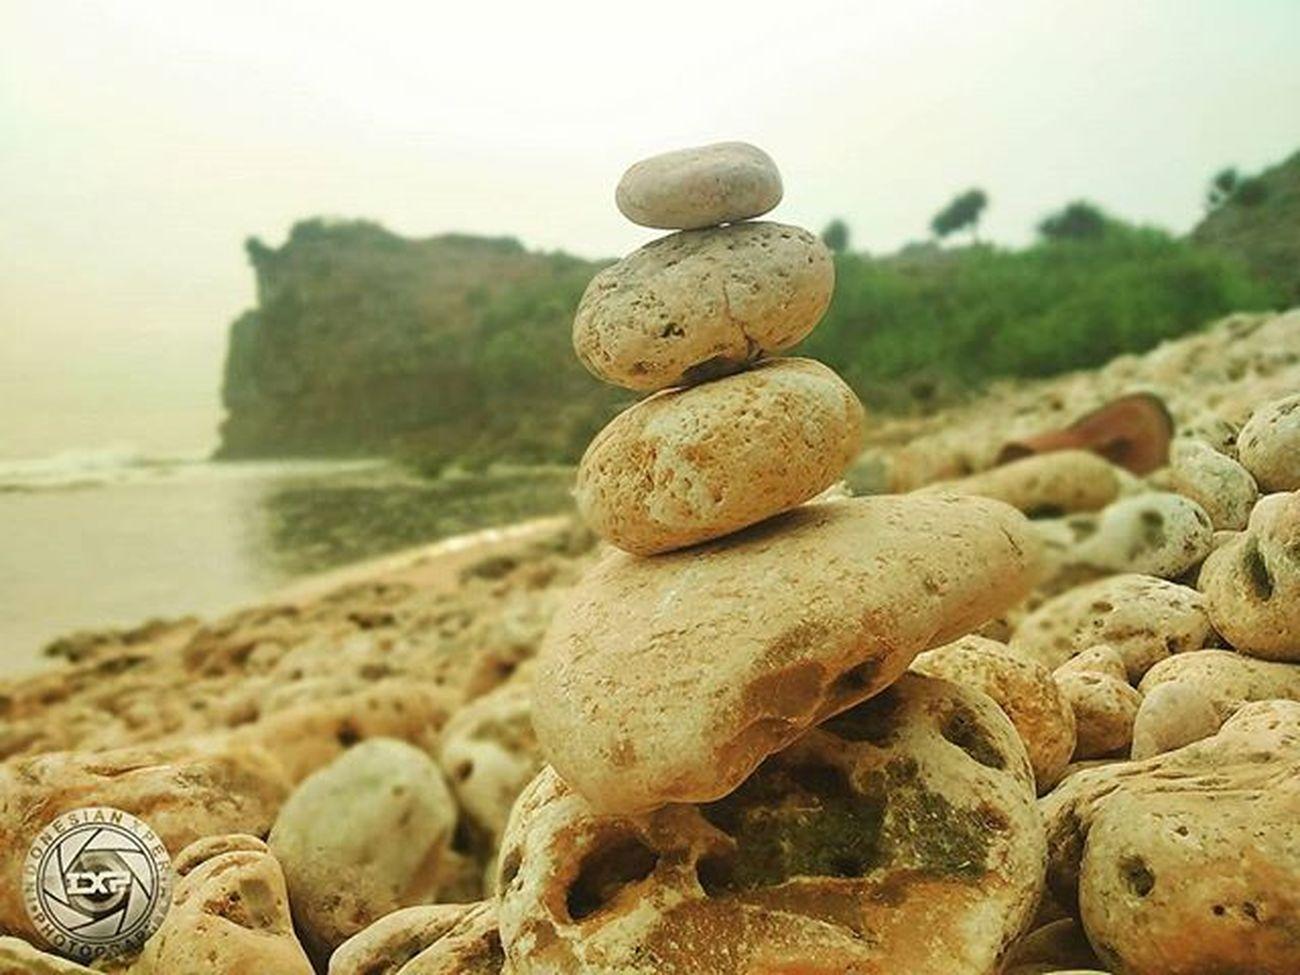 Keep balance 😎 Stackstones Backgrounddefocus Indonesiaxperiaphotography Xperiaindo Snapseed Travel Ngeden Yogyakarta